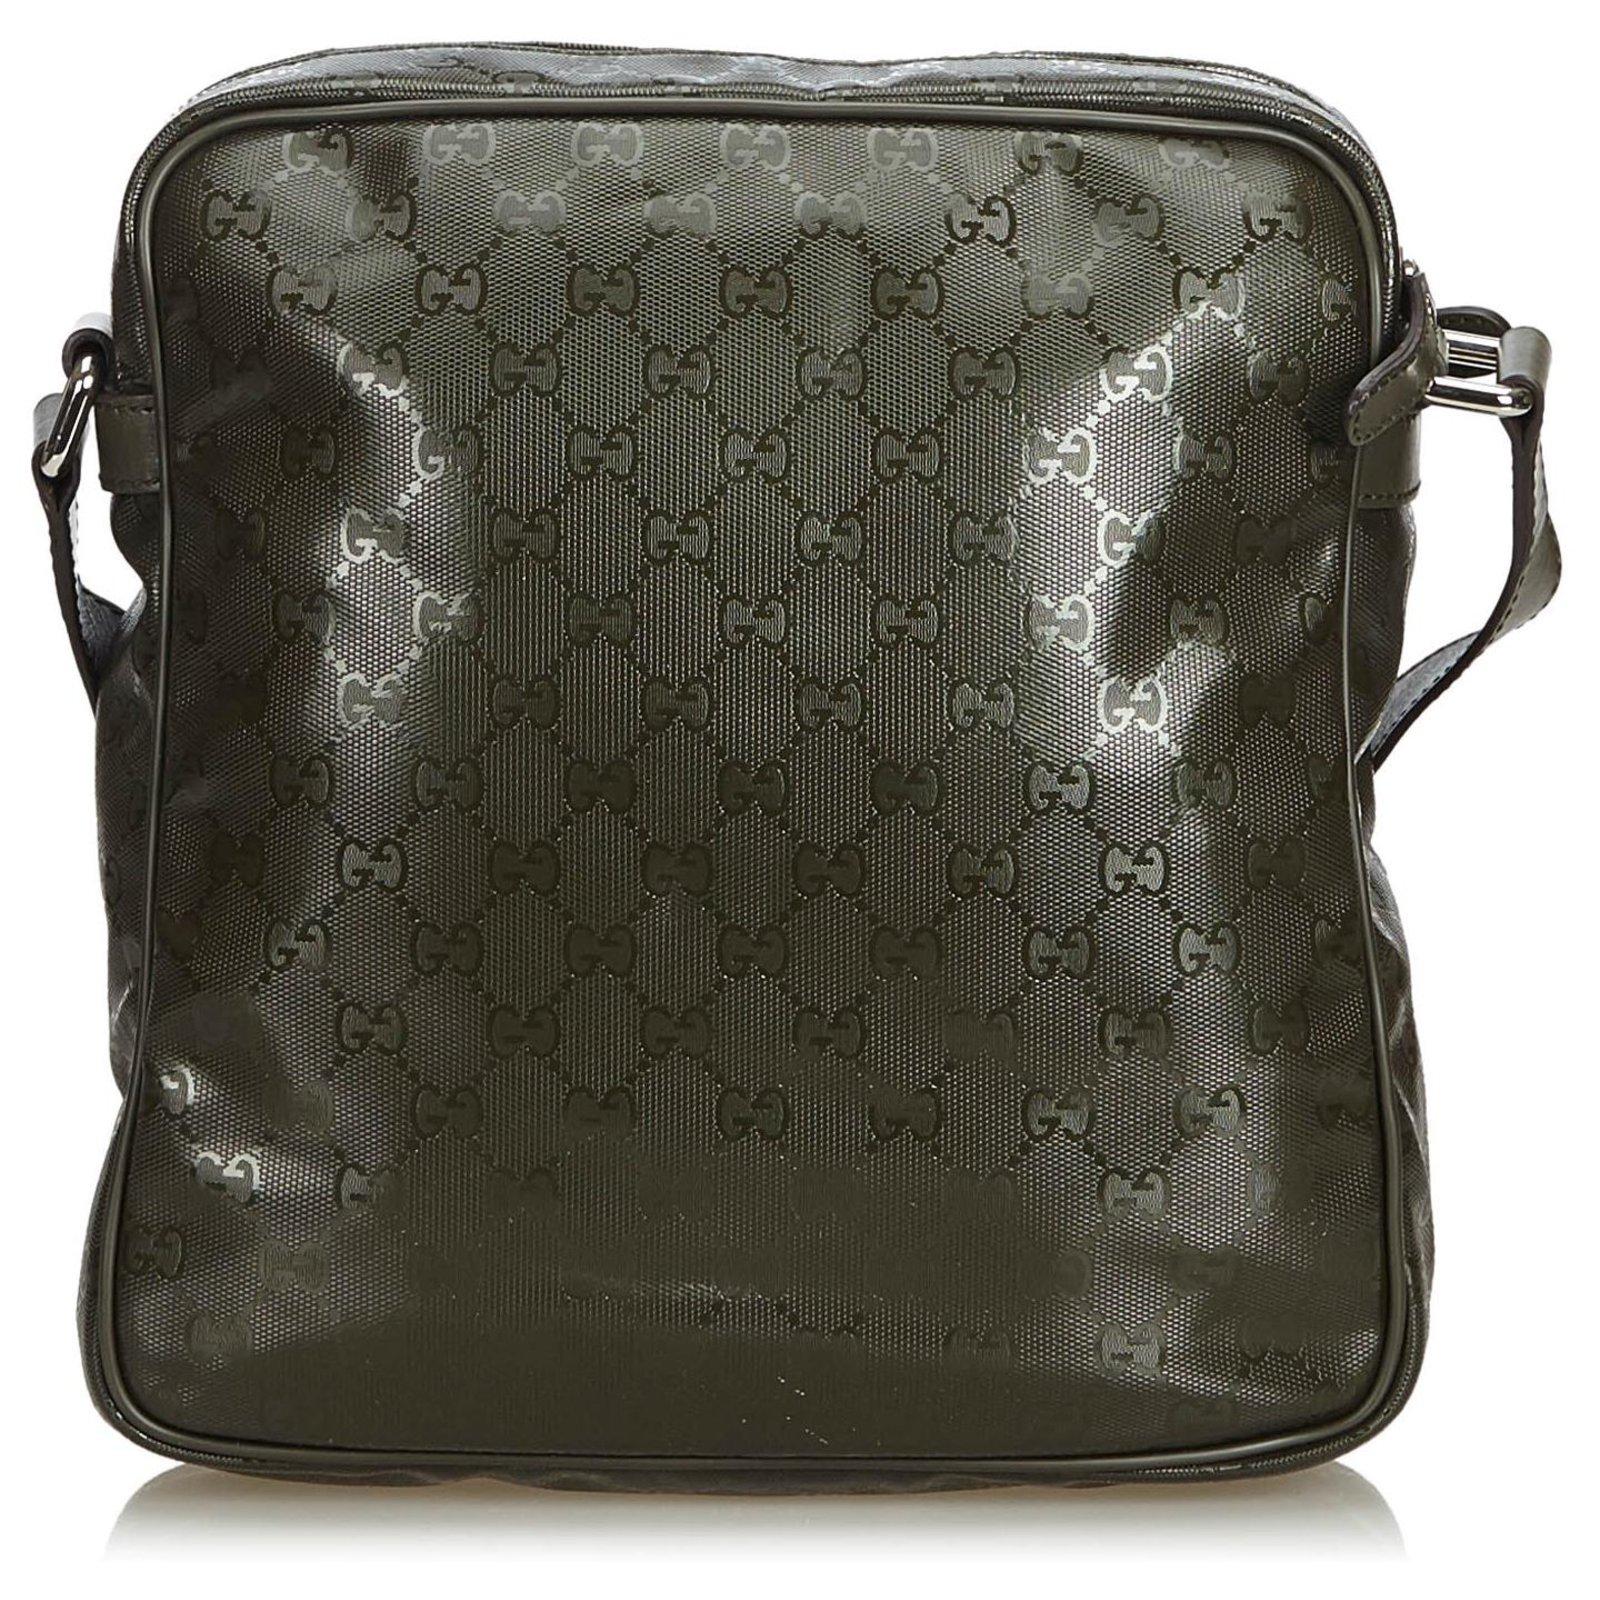 77f97885001f Gucci Gucci Black GG Imprime Crossbody Bag Handbags Leather,Other,Plastic  Black ref.120525 - Joli Closet